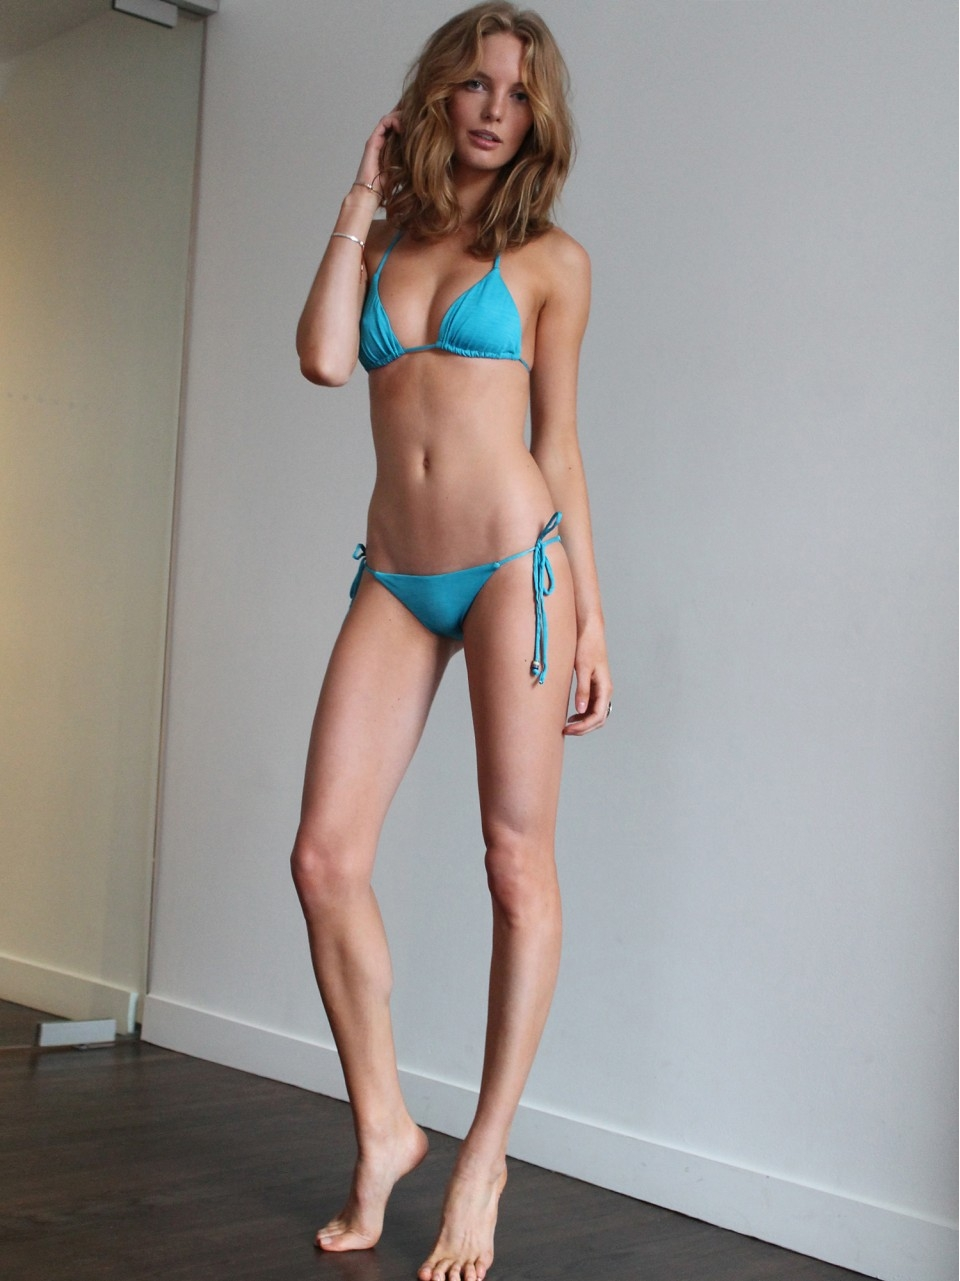 Bikini Clara Settje nudes (35 photos), Twitter